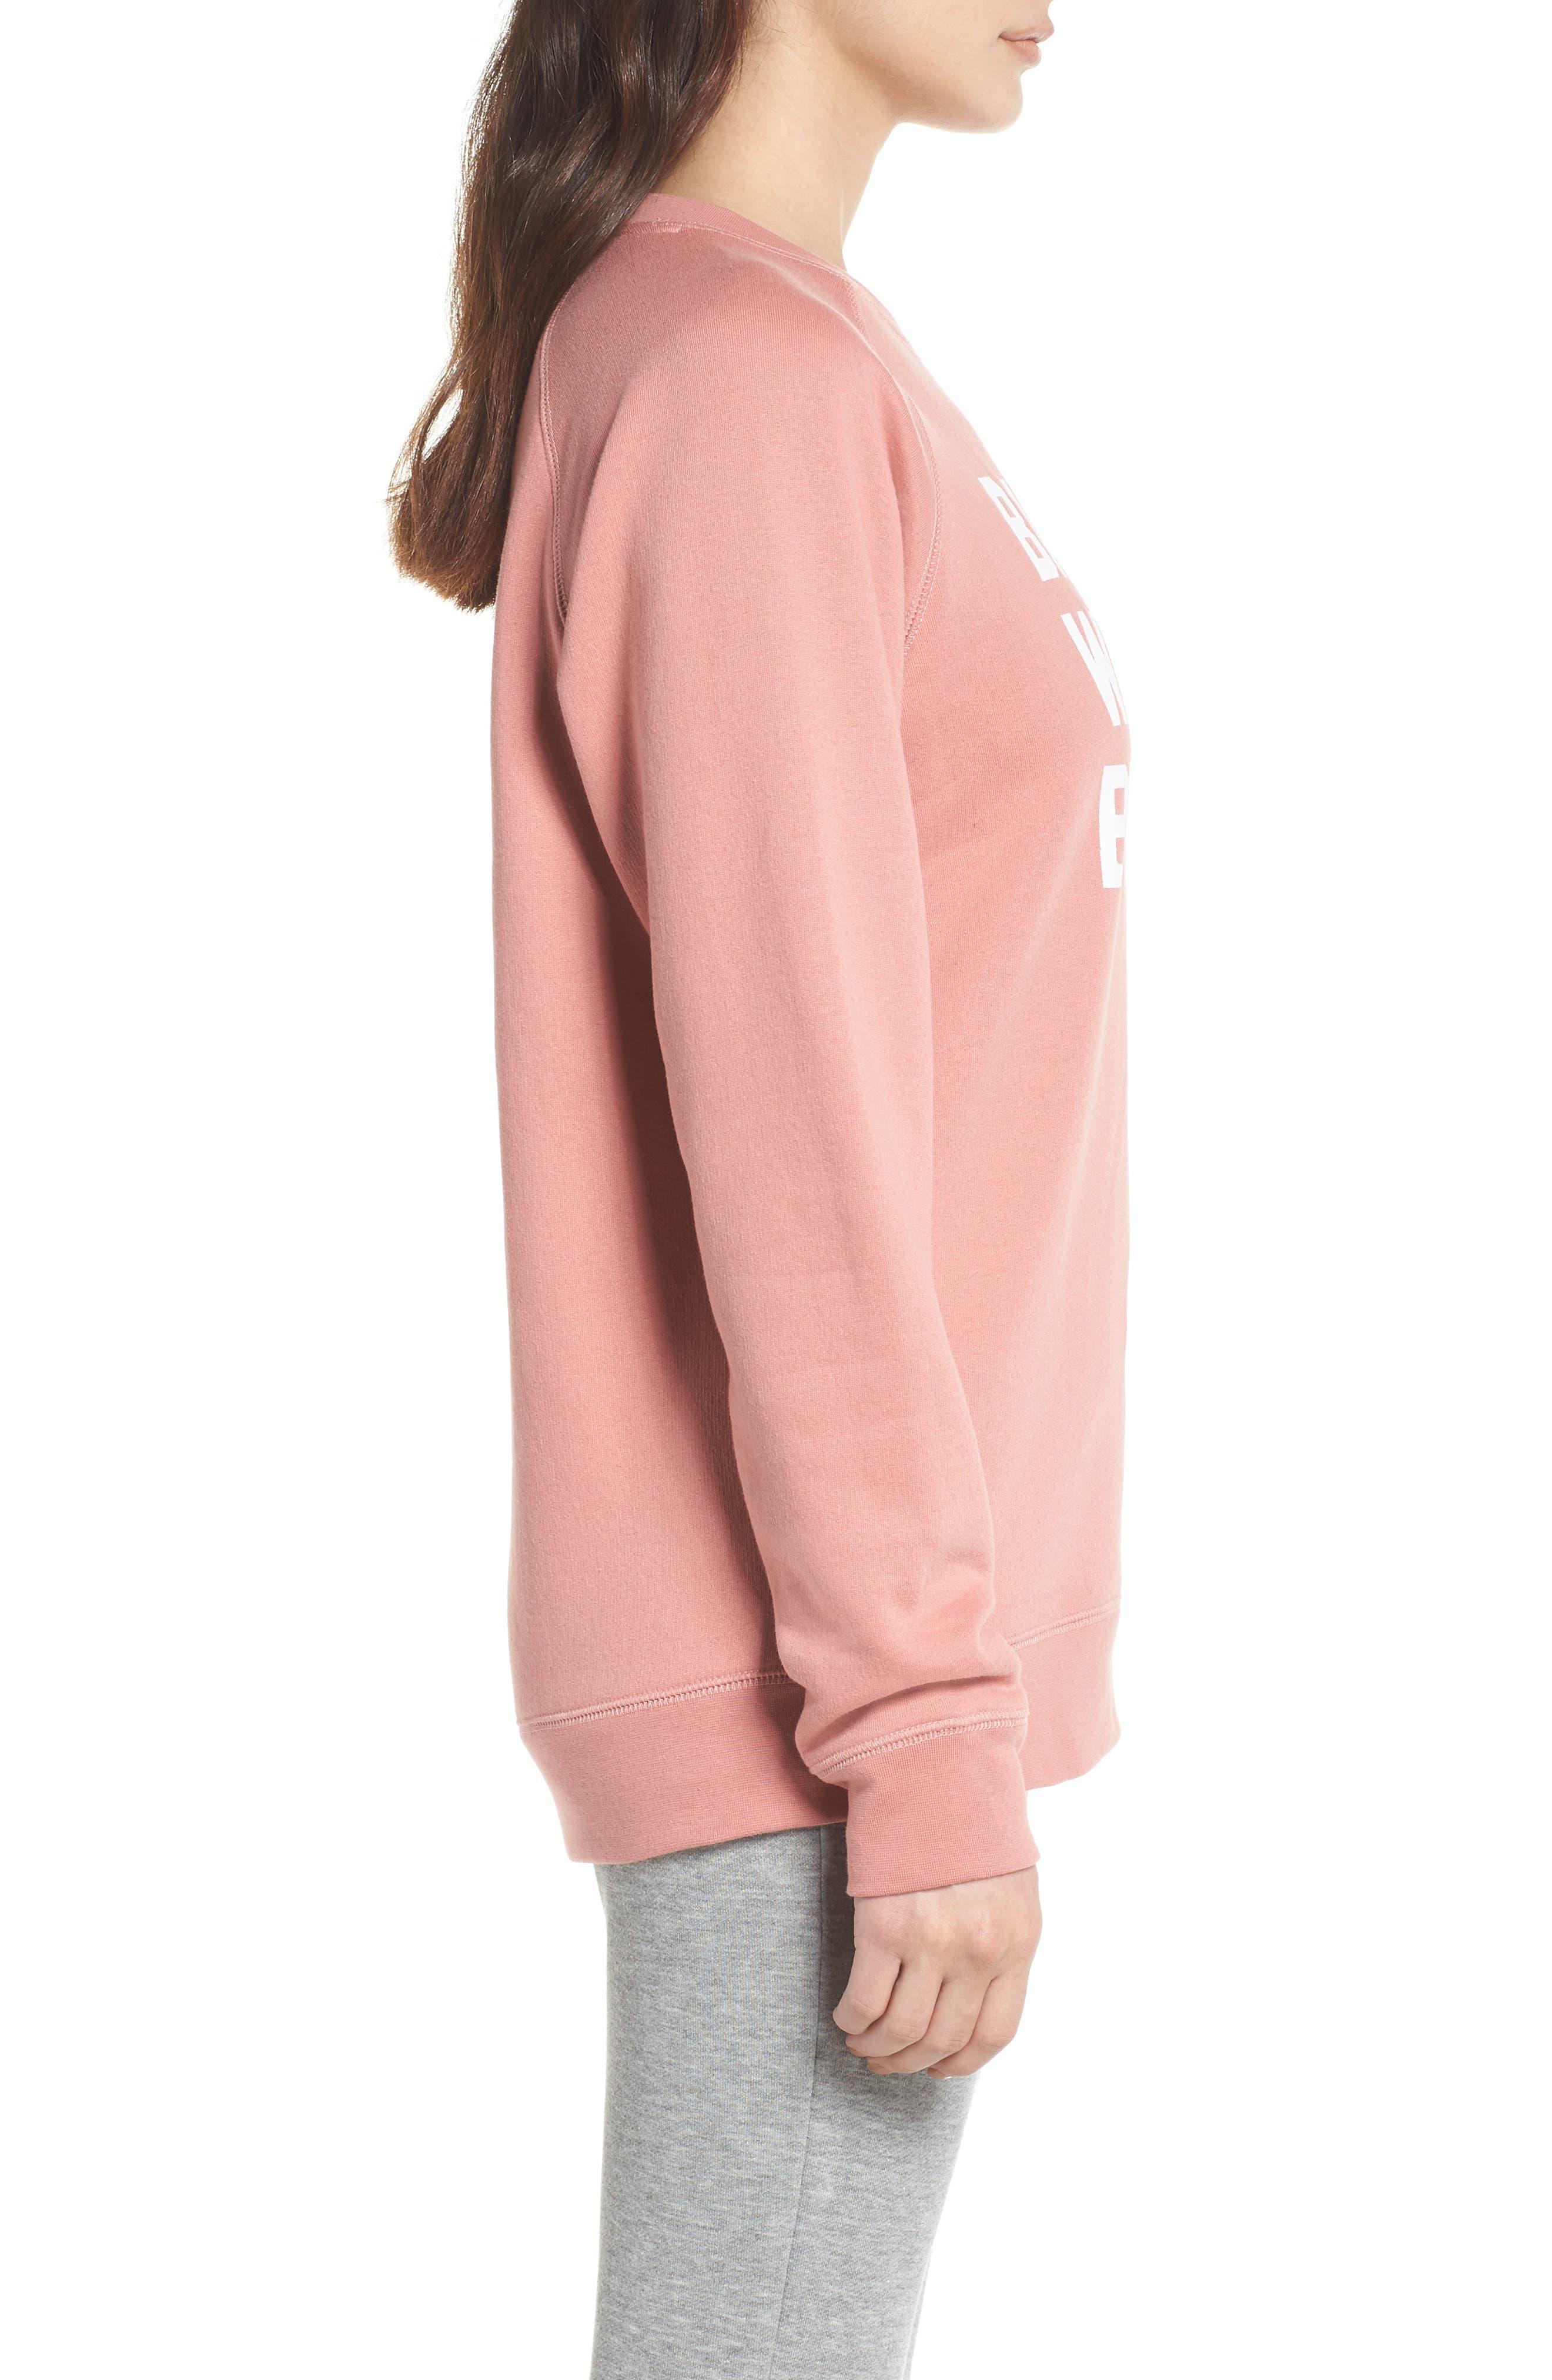 Babes Who Brunch Sweatshirt,                             Alternate thumbnail 3, color,                             955